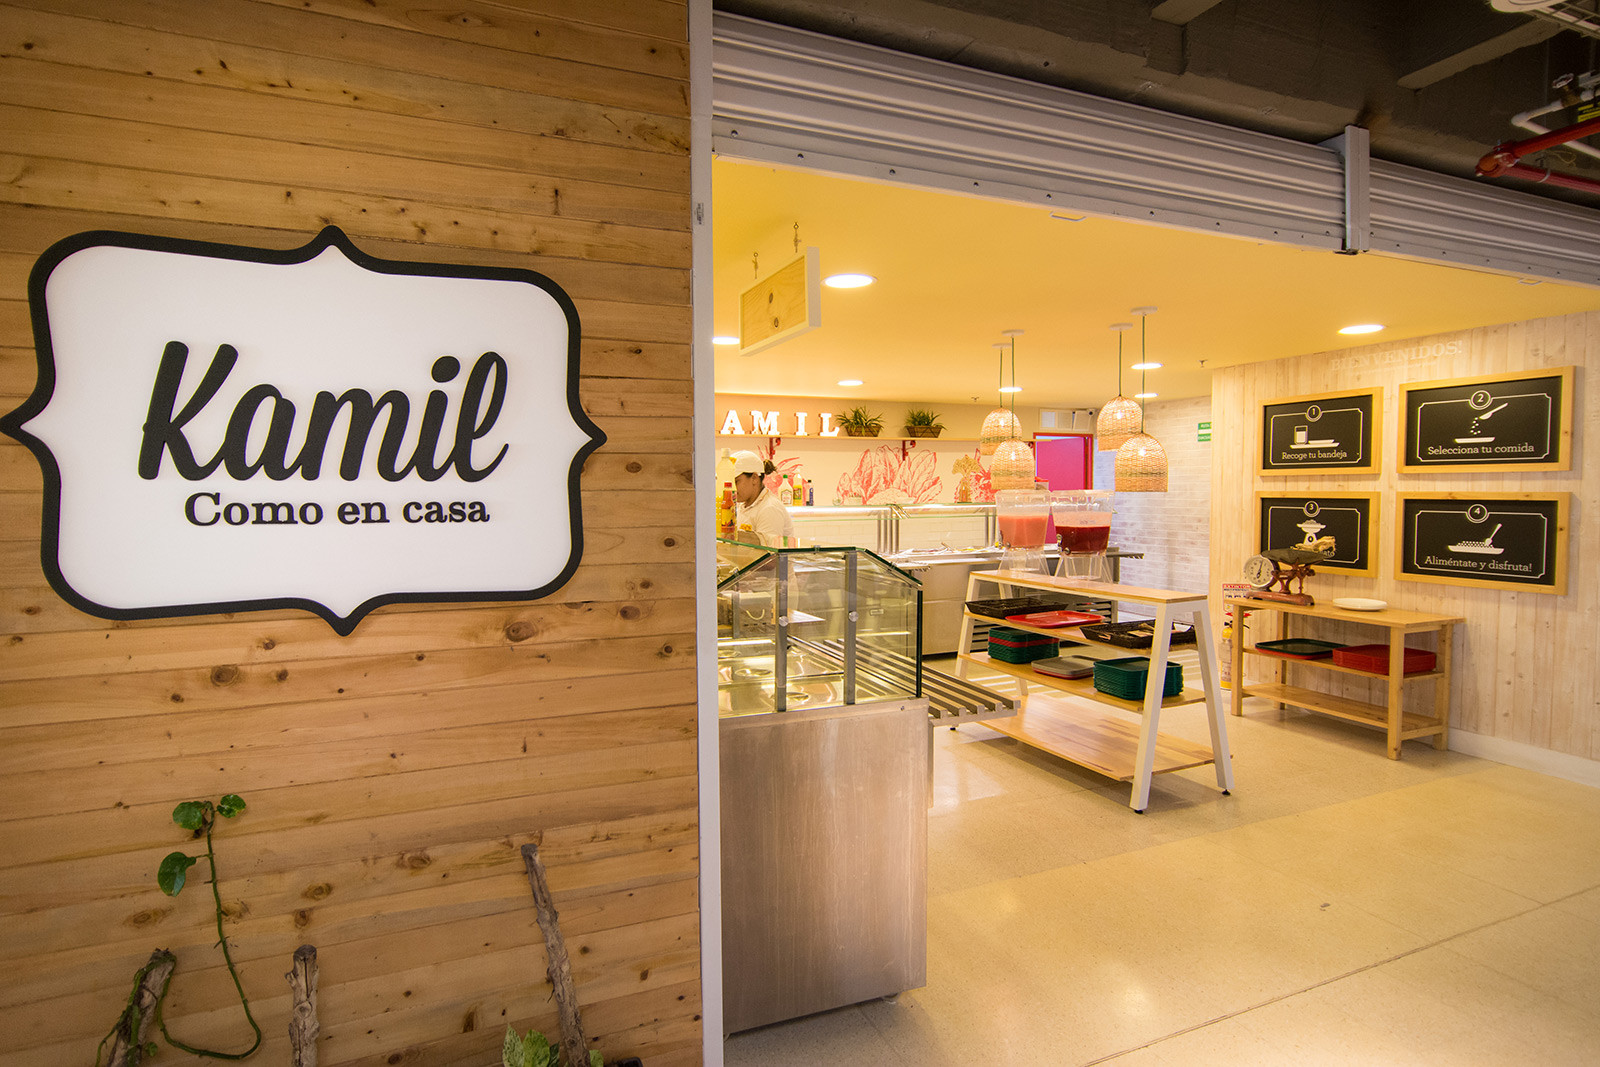 001-kamil-hptu-hospital-medellin-restaur